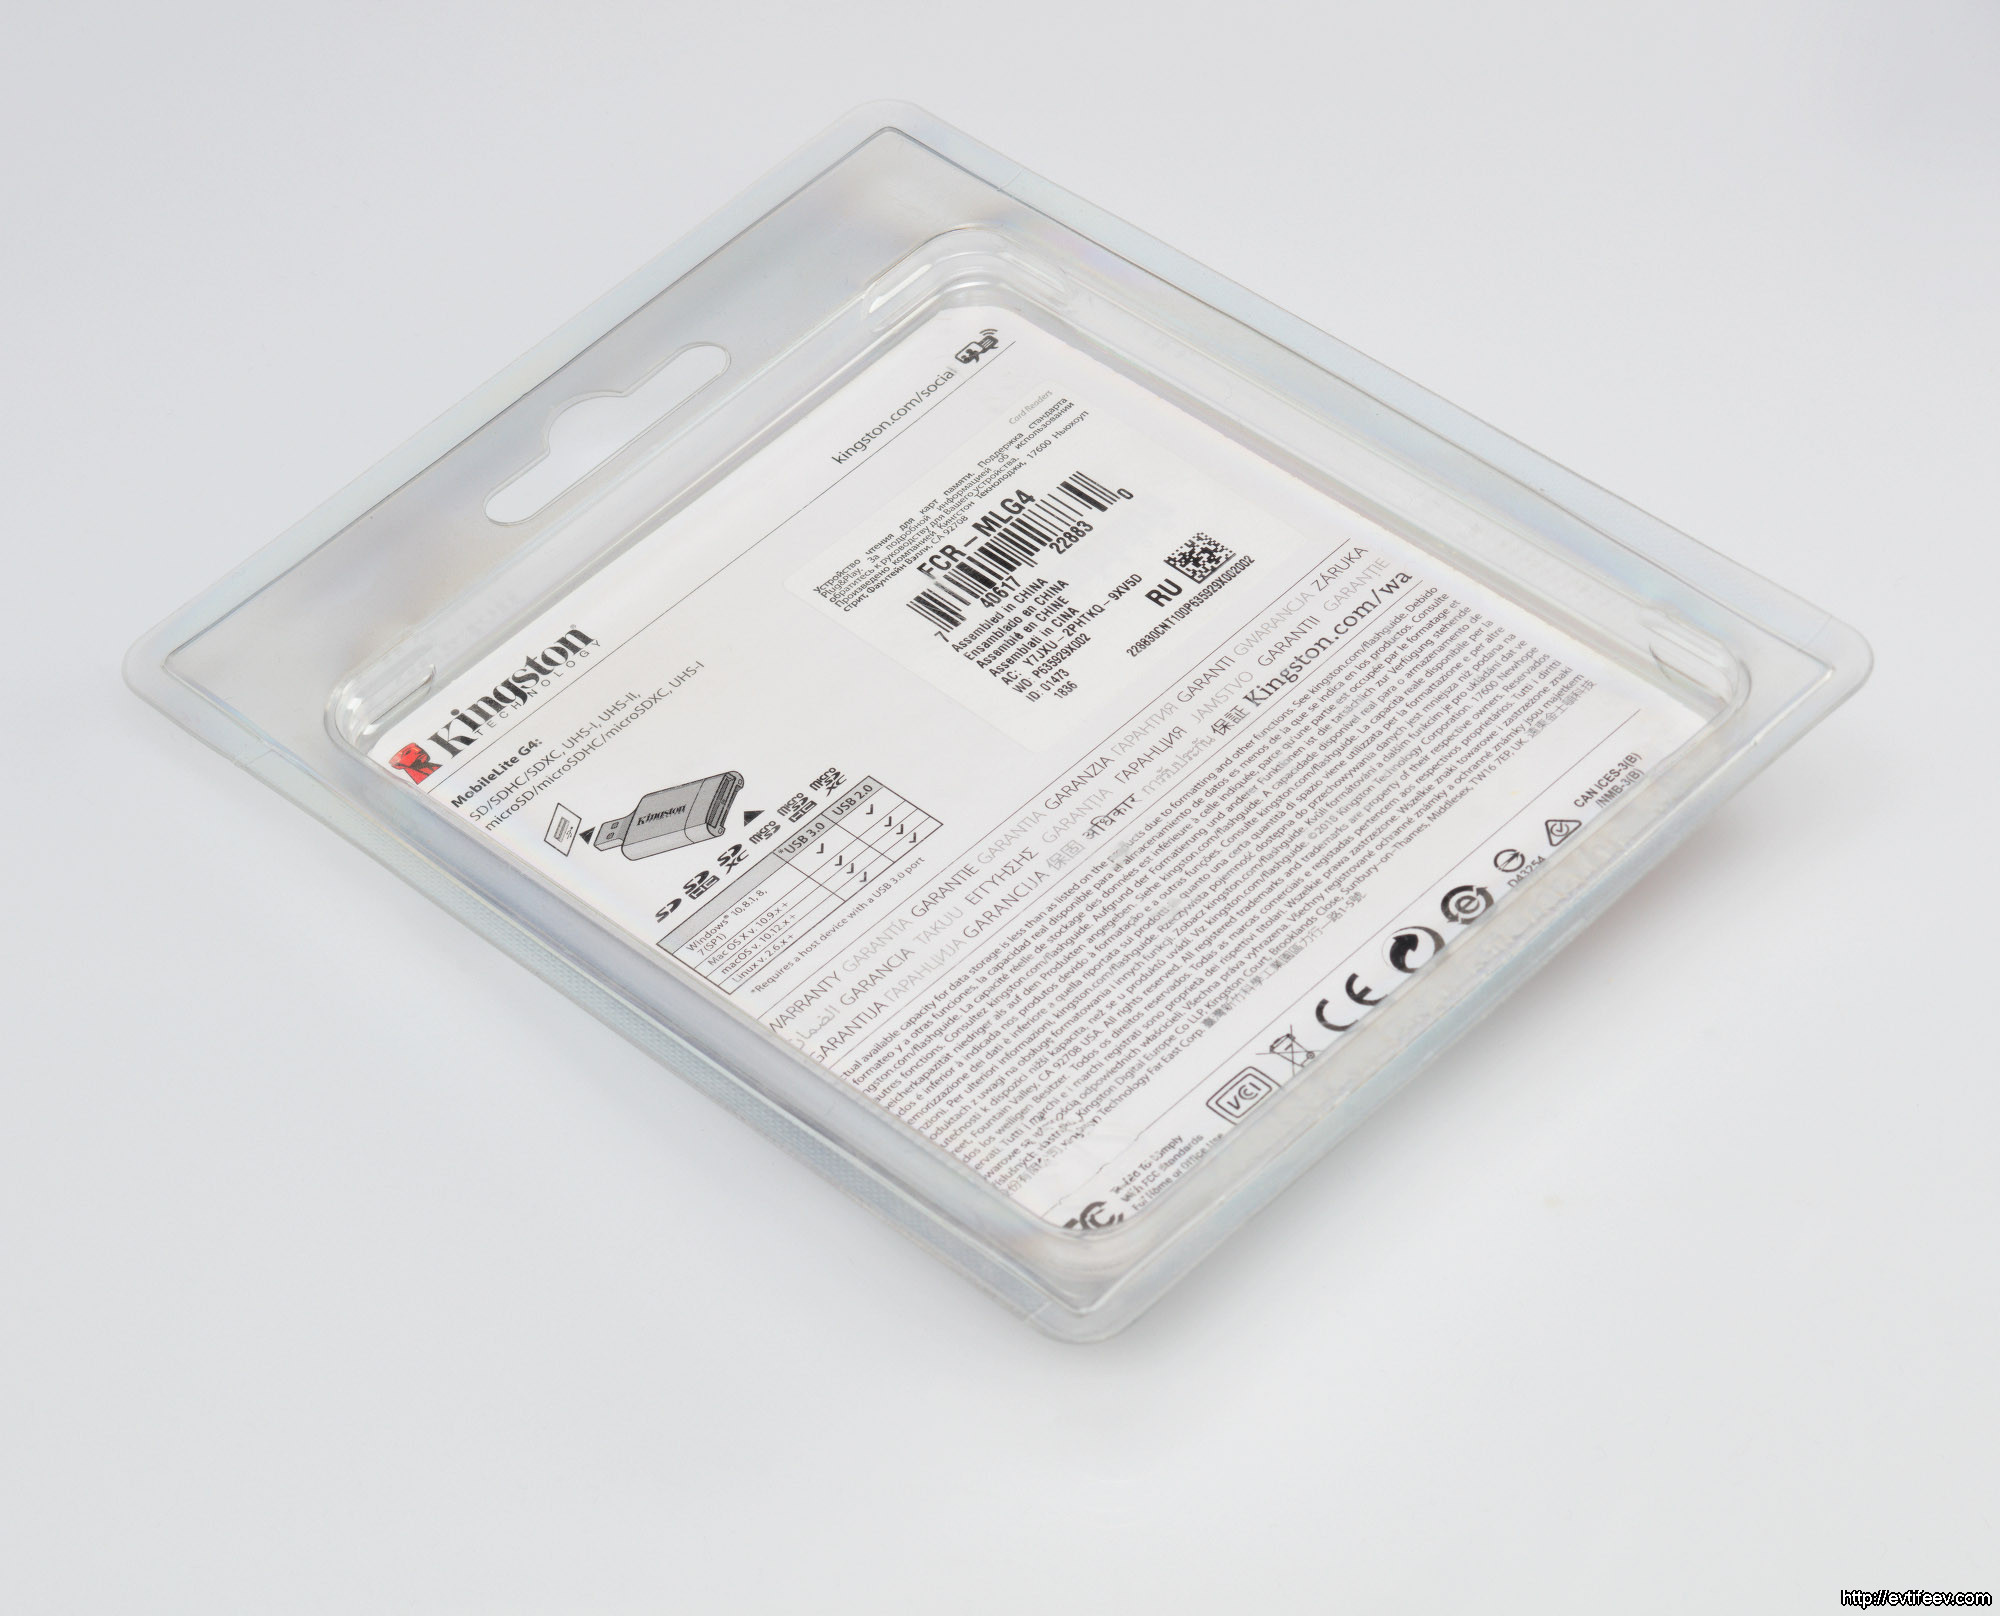 Обзор карт памяти для фотографа на примере Kingston Canvas React